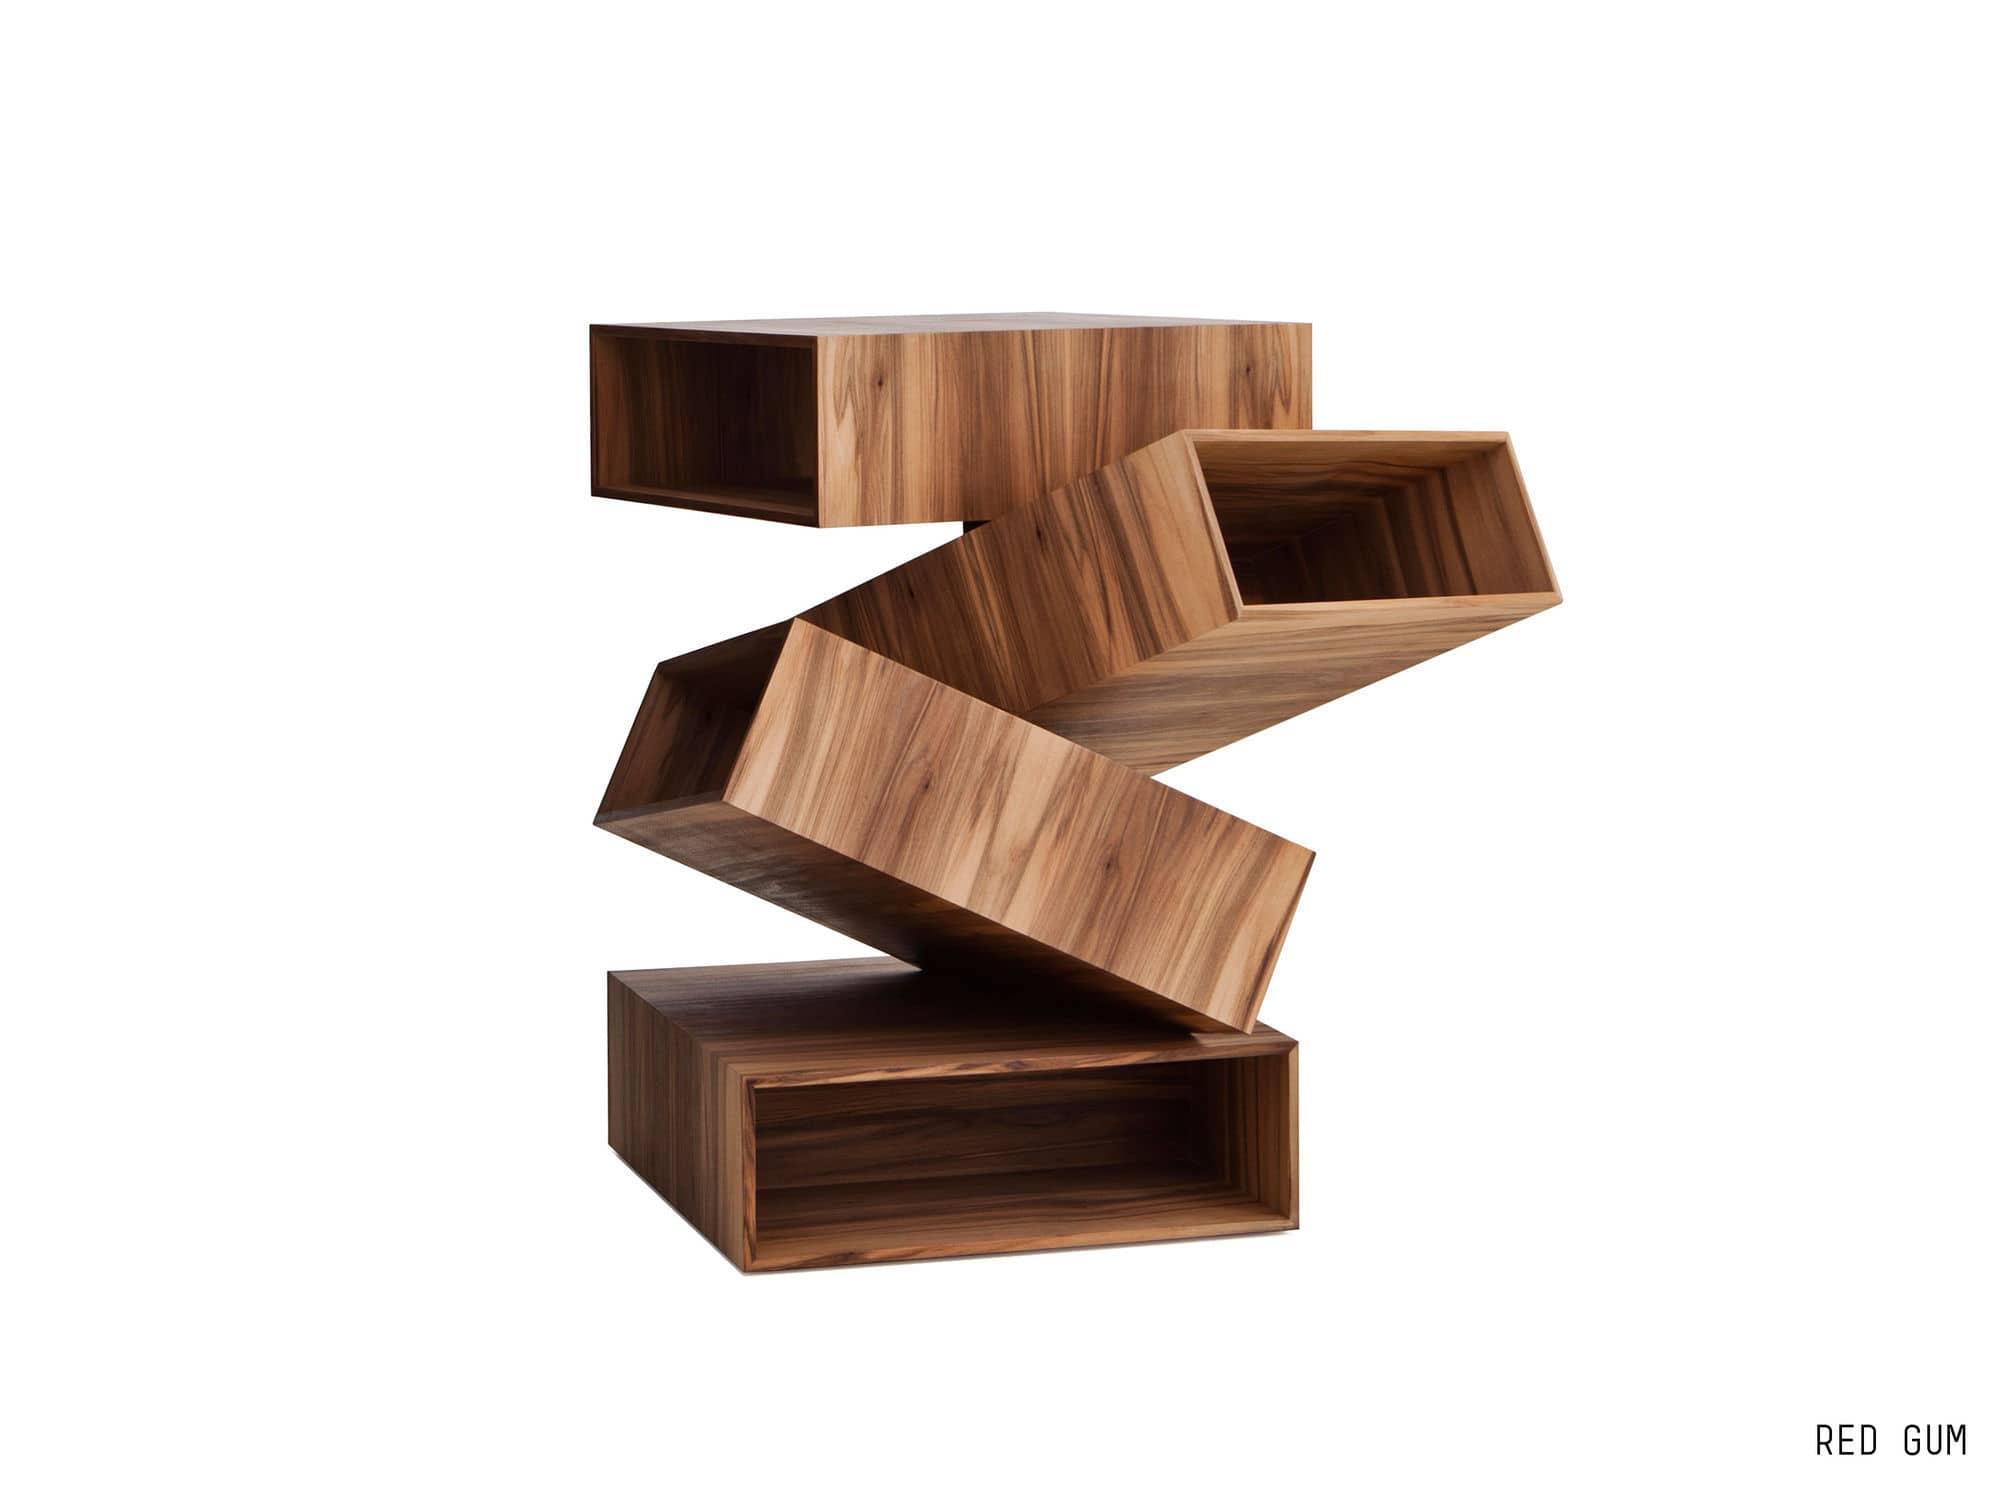 Beistelltisch Design beistelltisch originelles design holz metall quadratisch